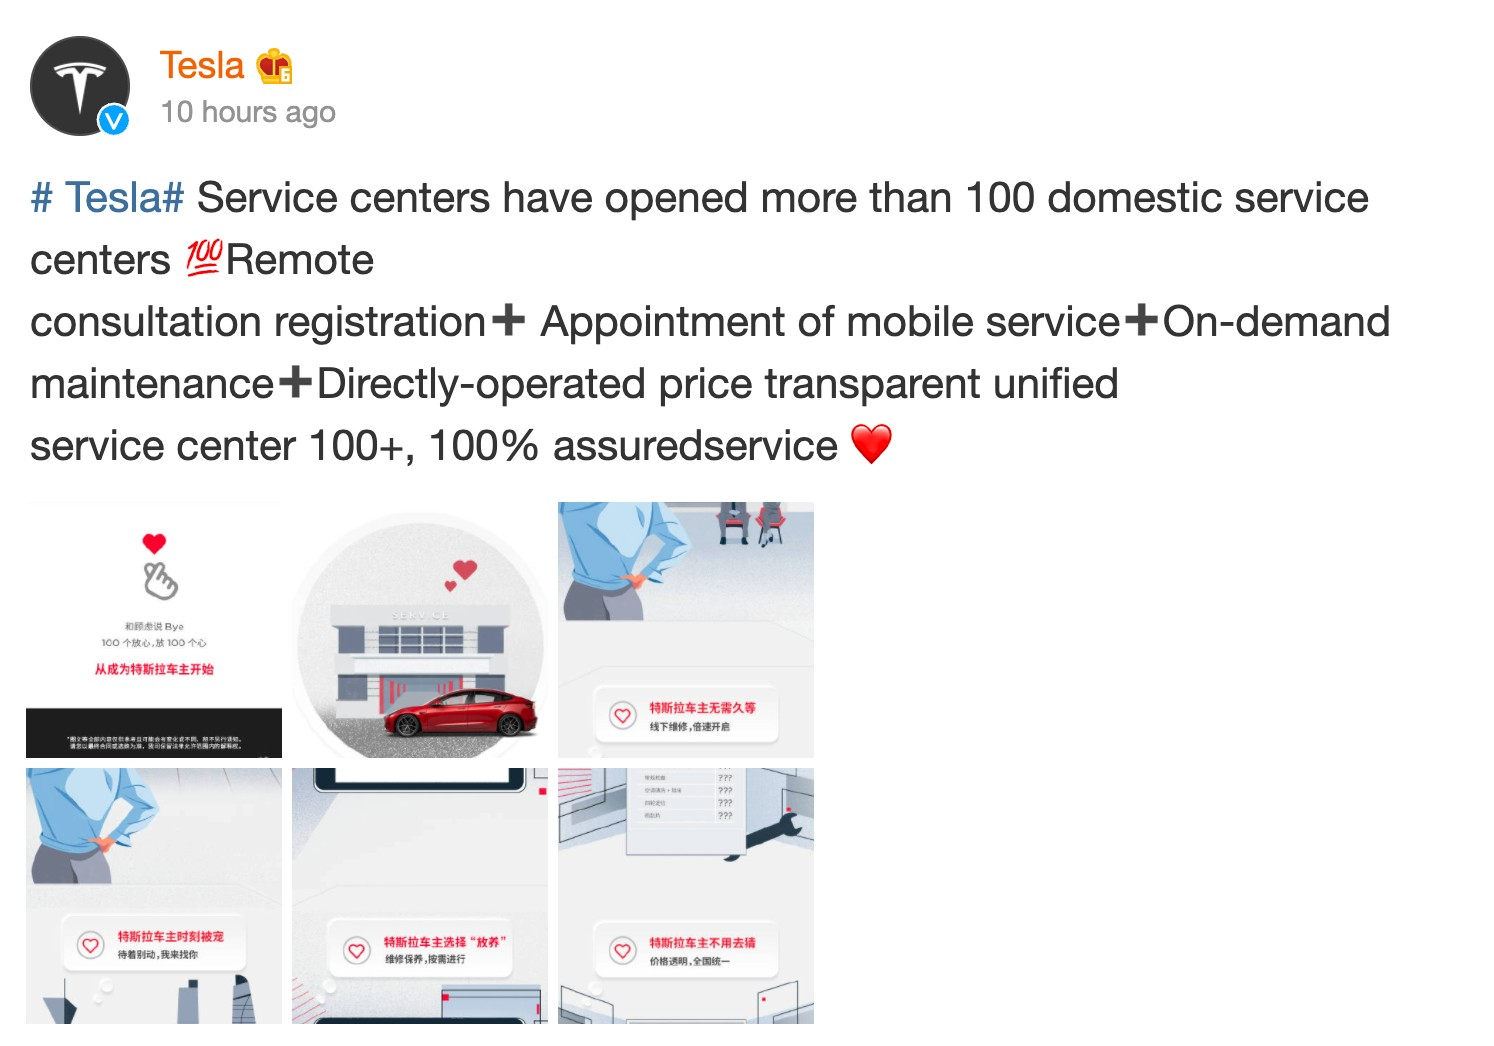 tesla-china-service-center-locations-100-milestone